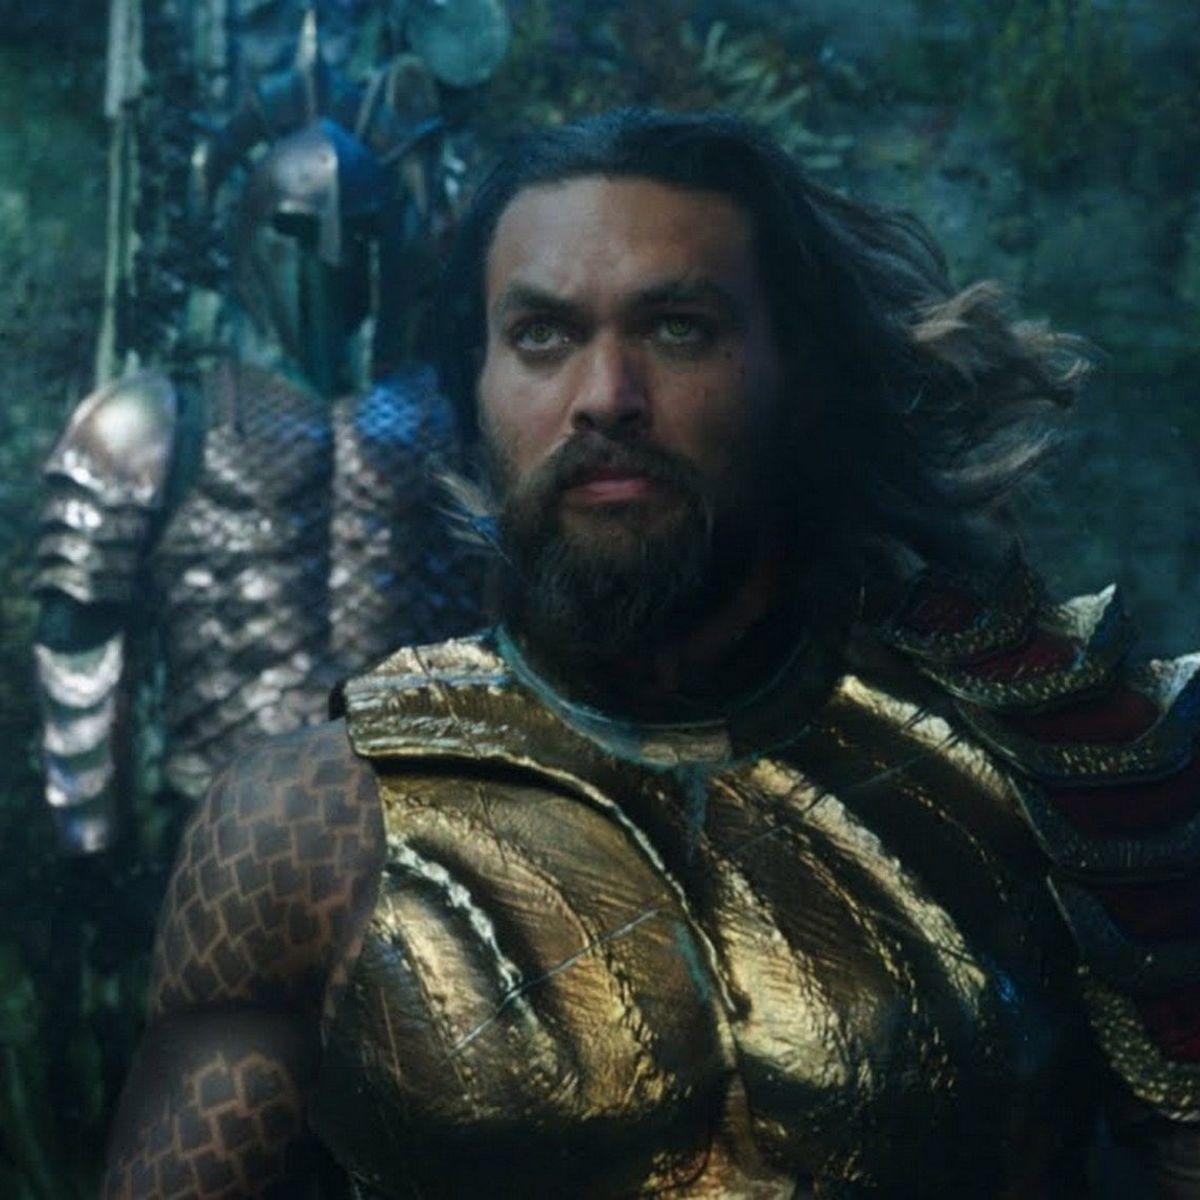 Jason Momoa Aquaman: Aquaman Screenwriter Says His Kids Can Watch The Movie